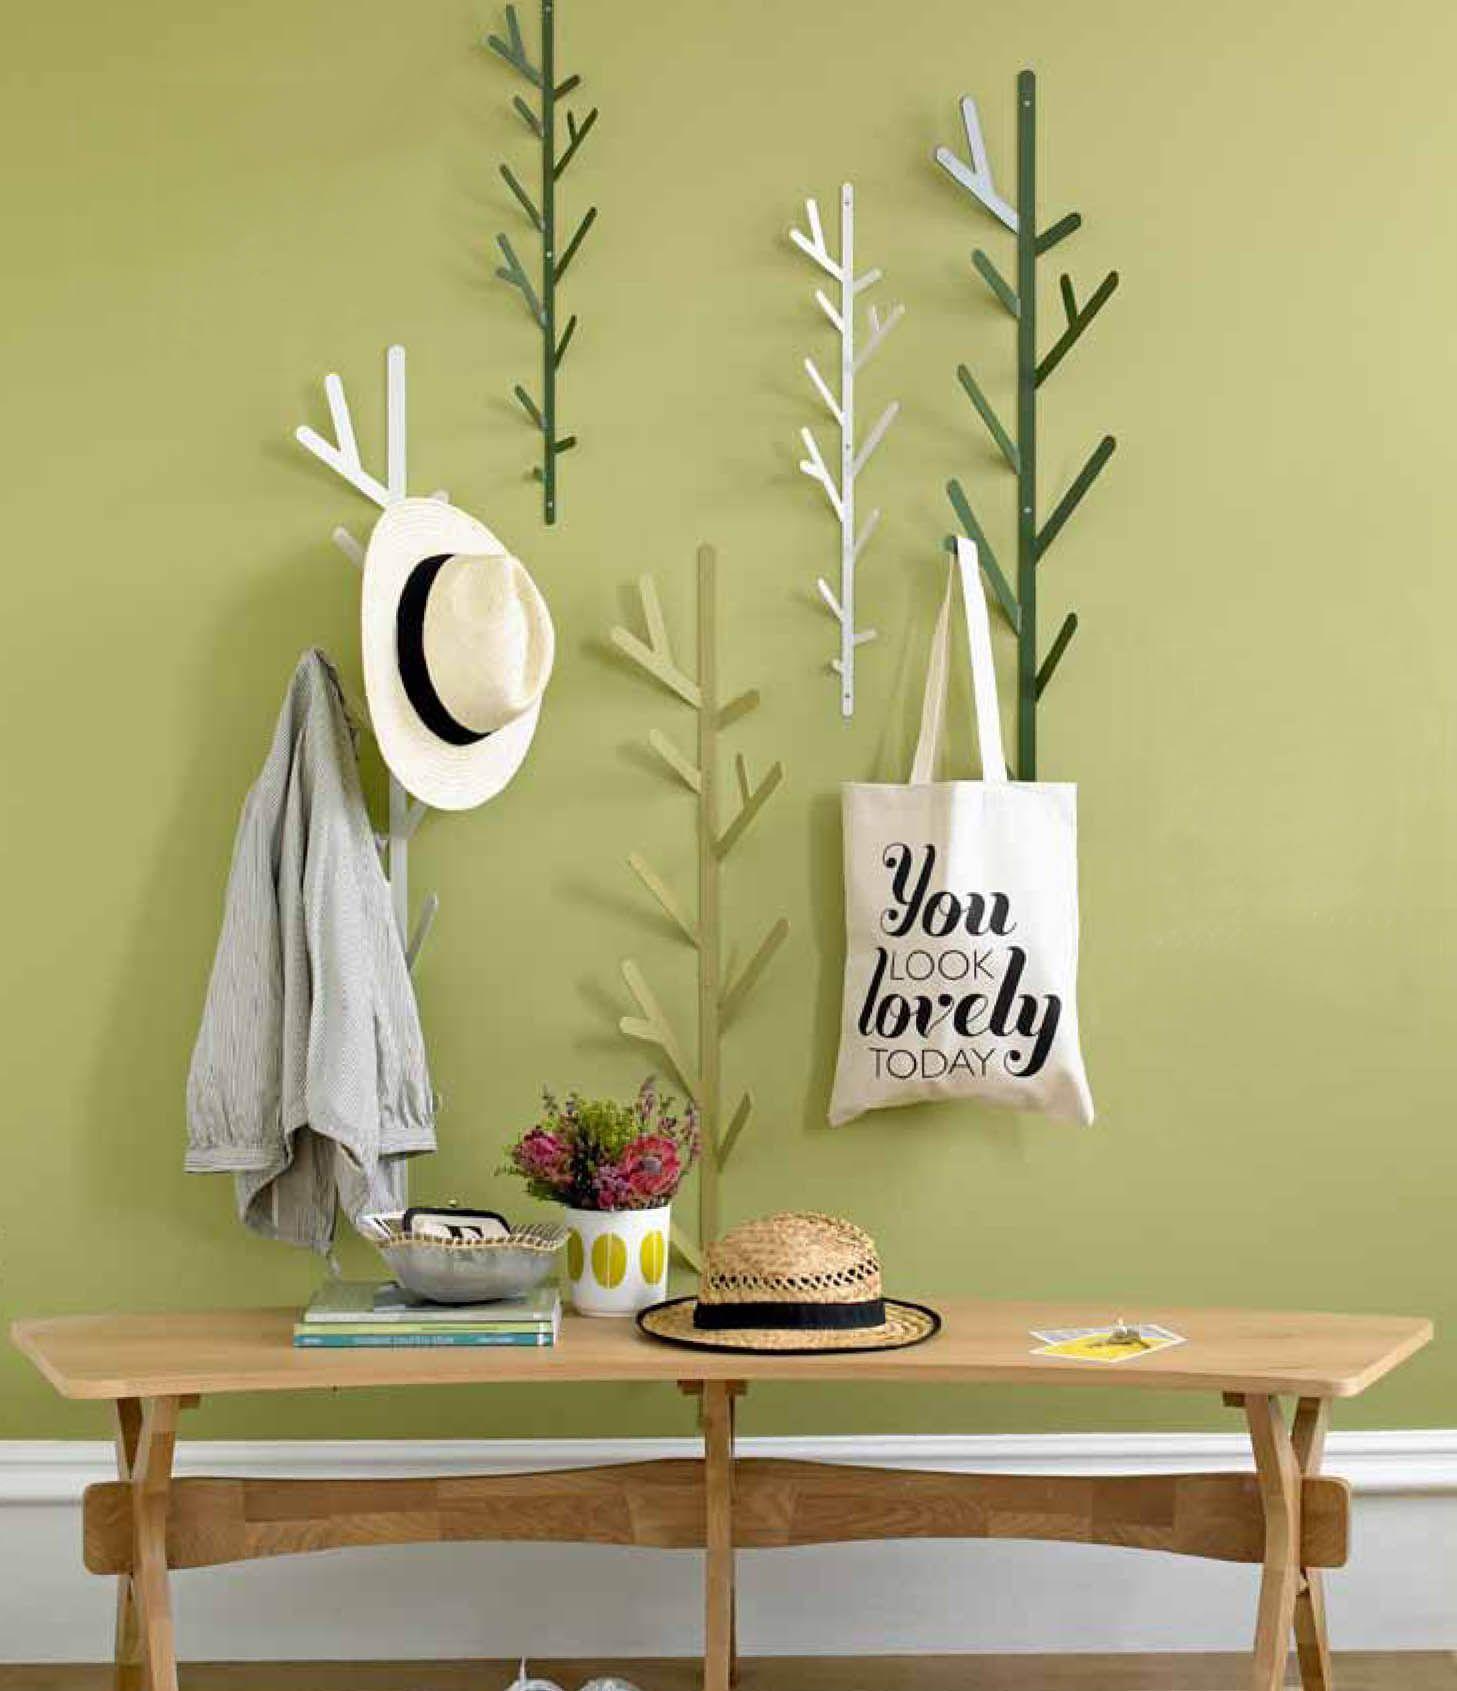 bouf coat hooks | DIY Interior Design | Pinterest | Coat hooks, Wall ...